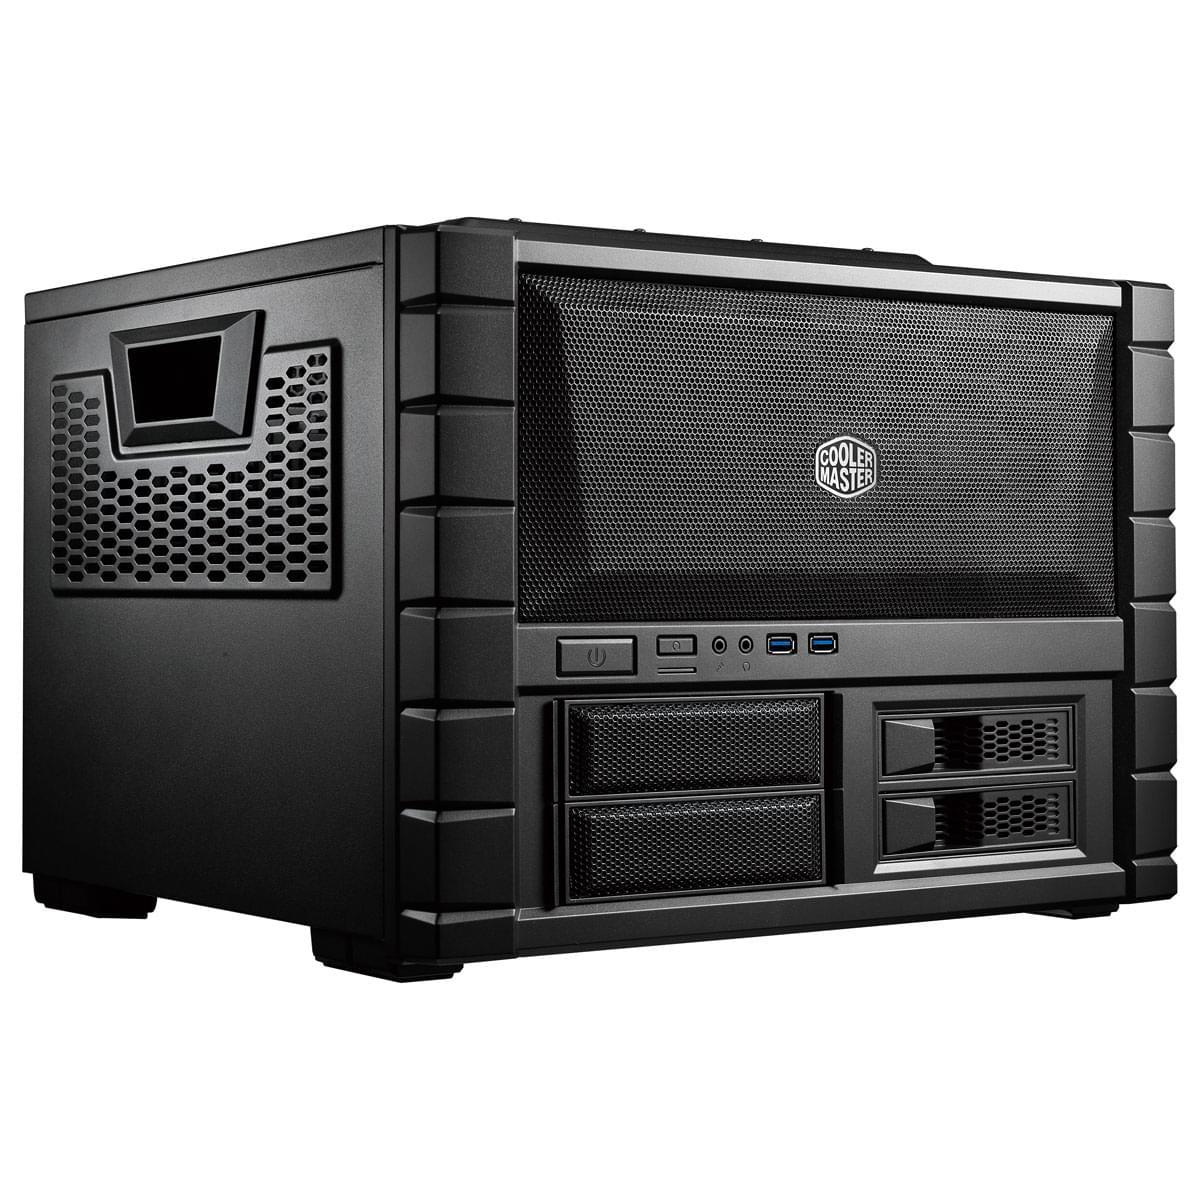 Cooler Master HAF XB-W RC-902XB-KWN1 (RC-902XB-KWN1 ) - Achat / Vente Boîtier PC sur Cybertek.fr - 0